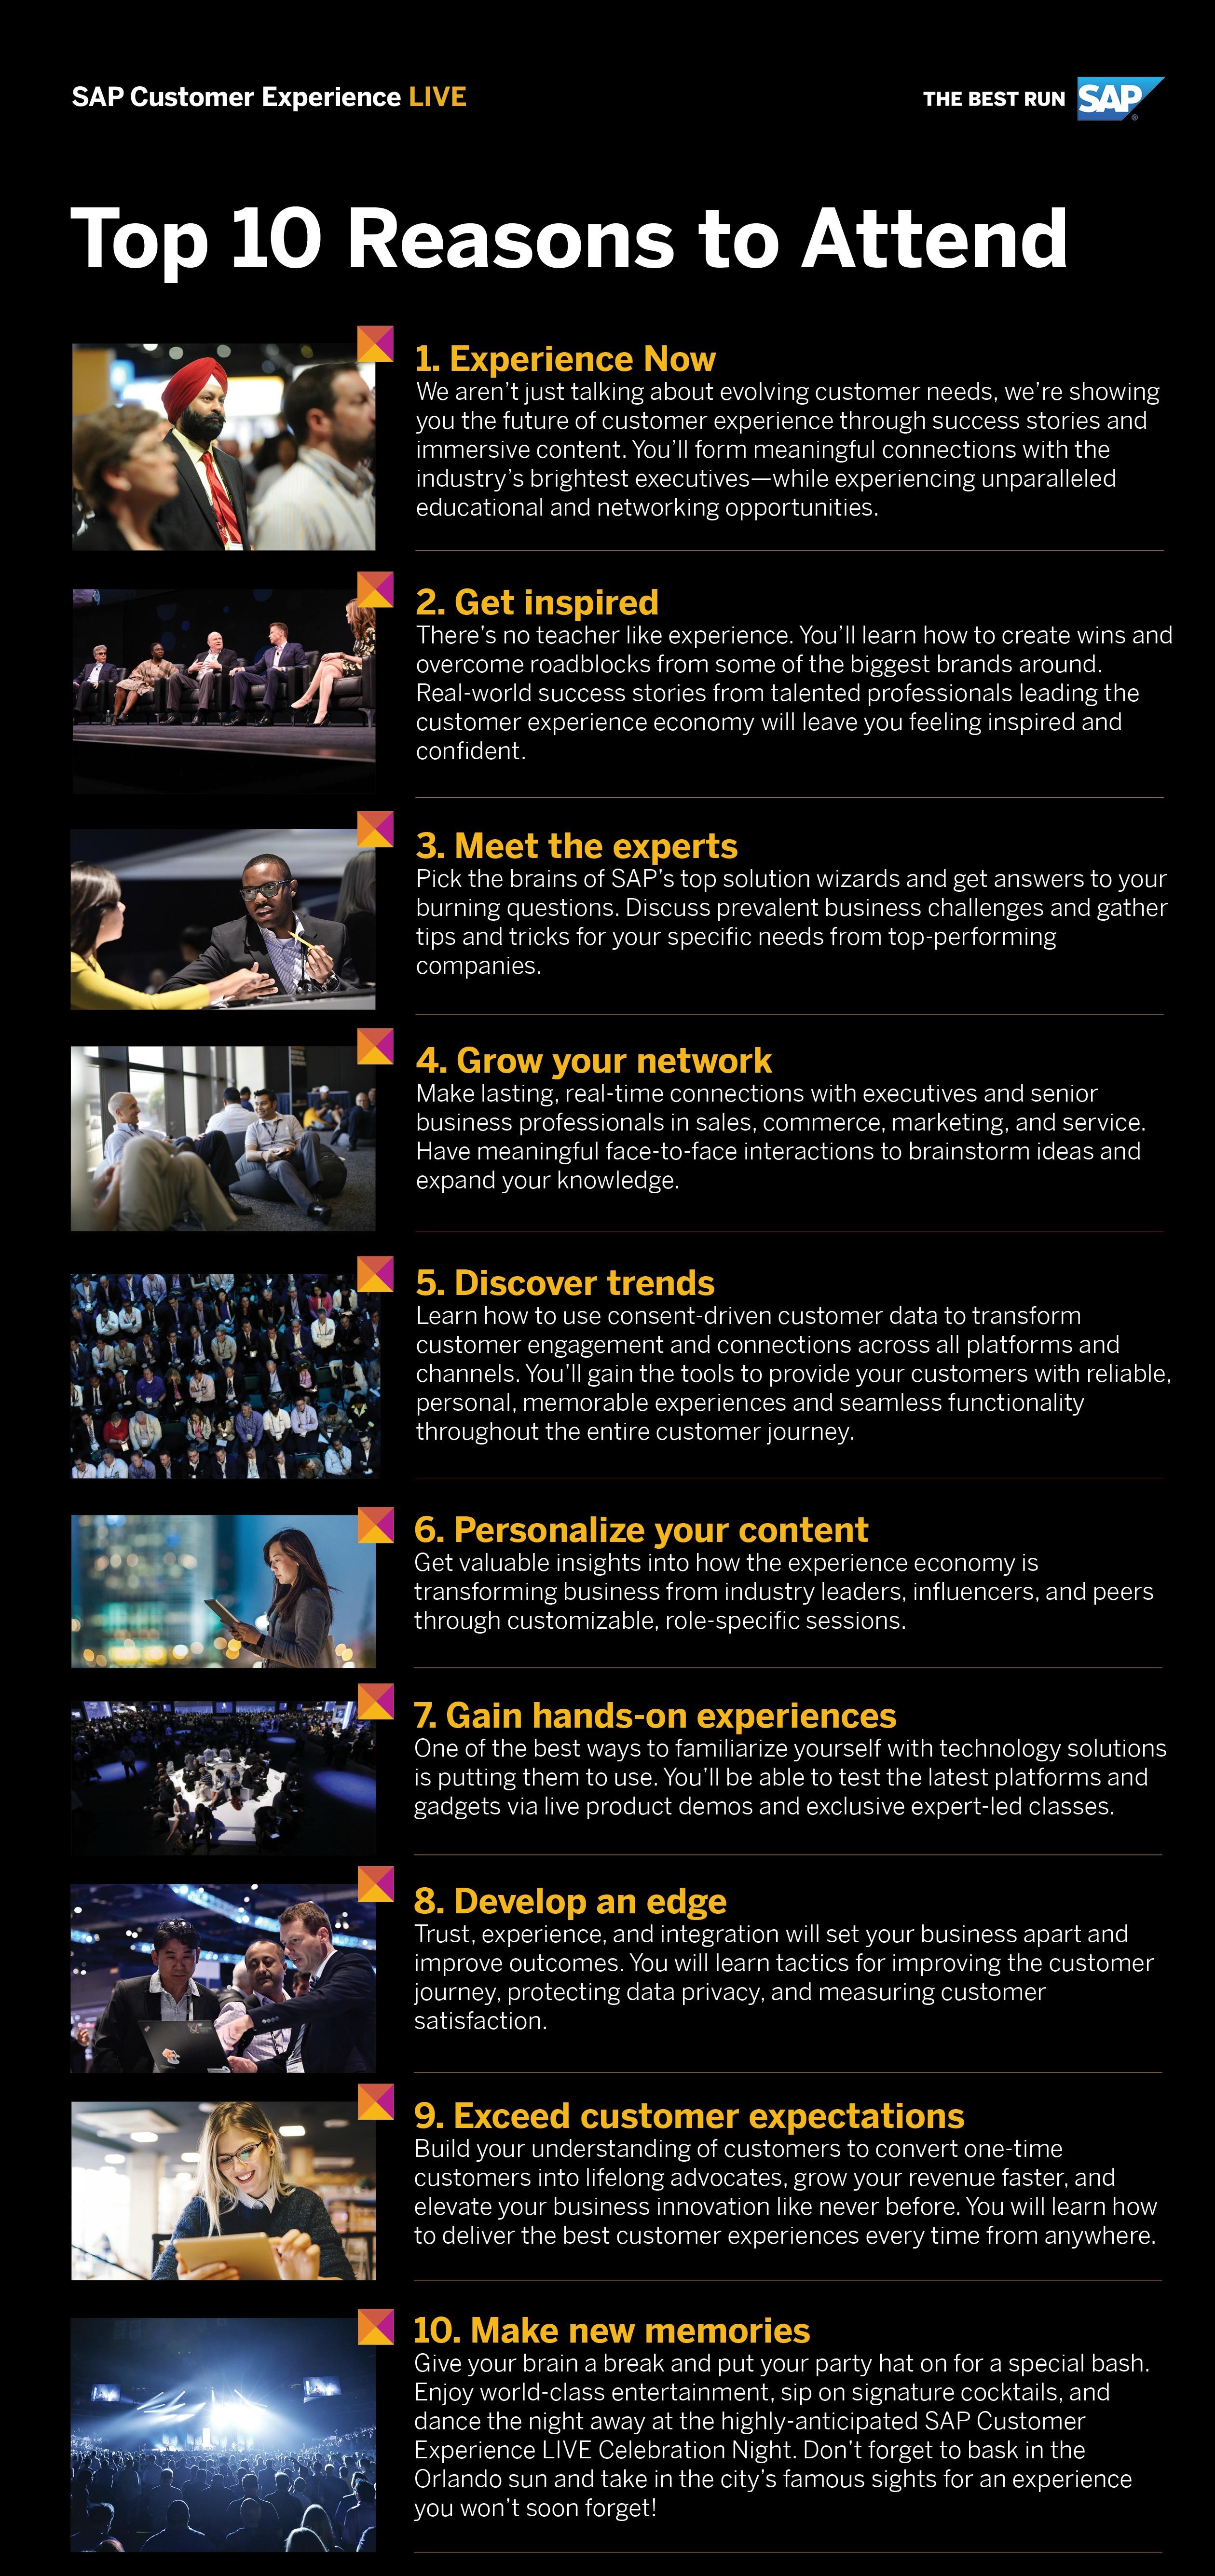 SAP_CXLIVE_Top10Reasons (1).jpg